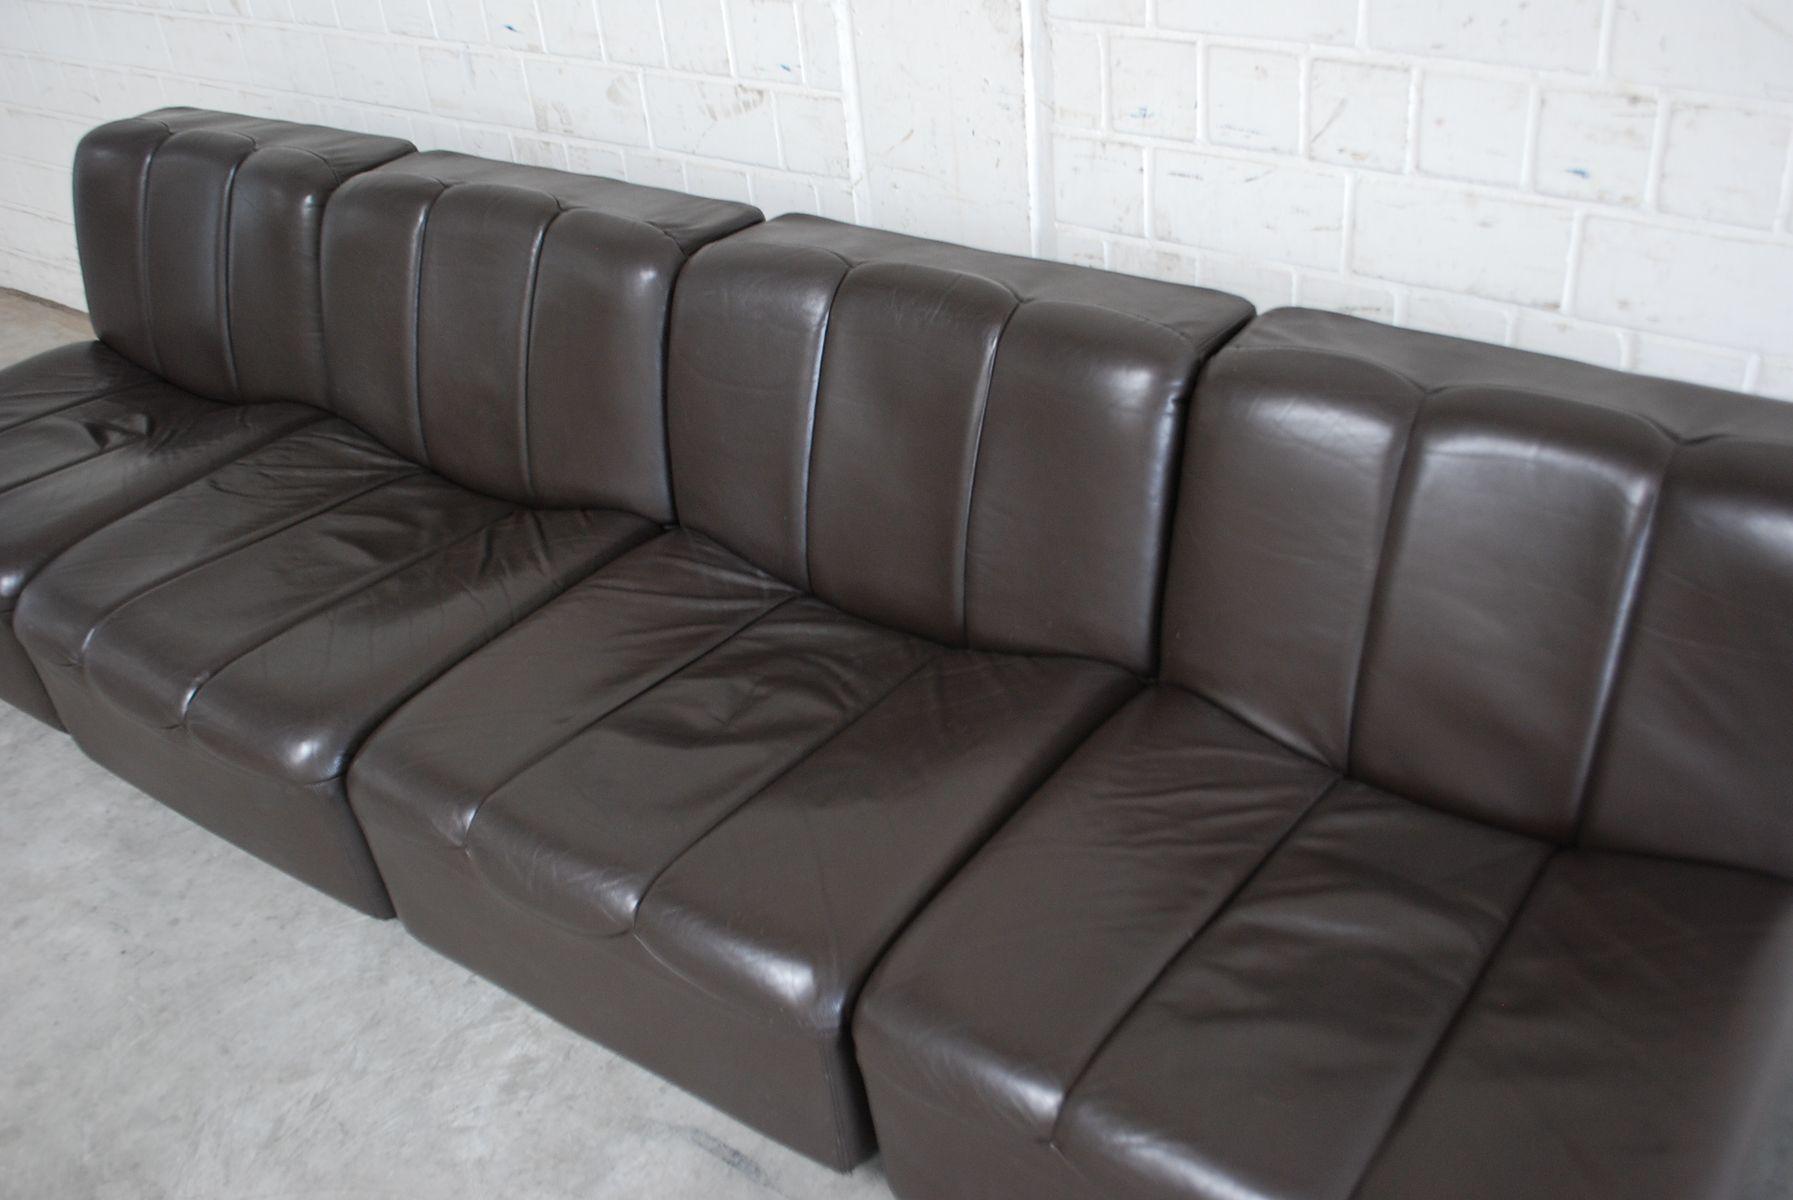 canap modulaire vintage en cuir brun 1970s en vente sur pamono. Black Bedroom Furniture Sets. Home Design Ideas